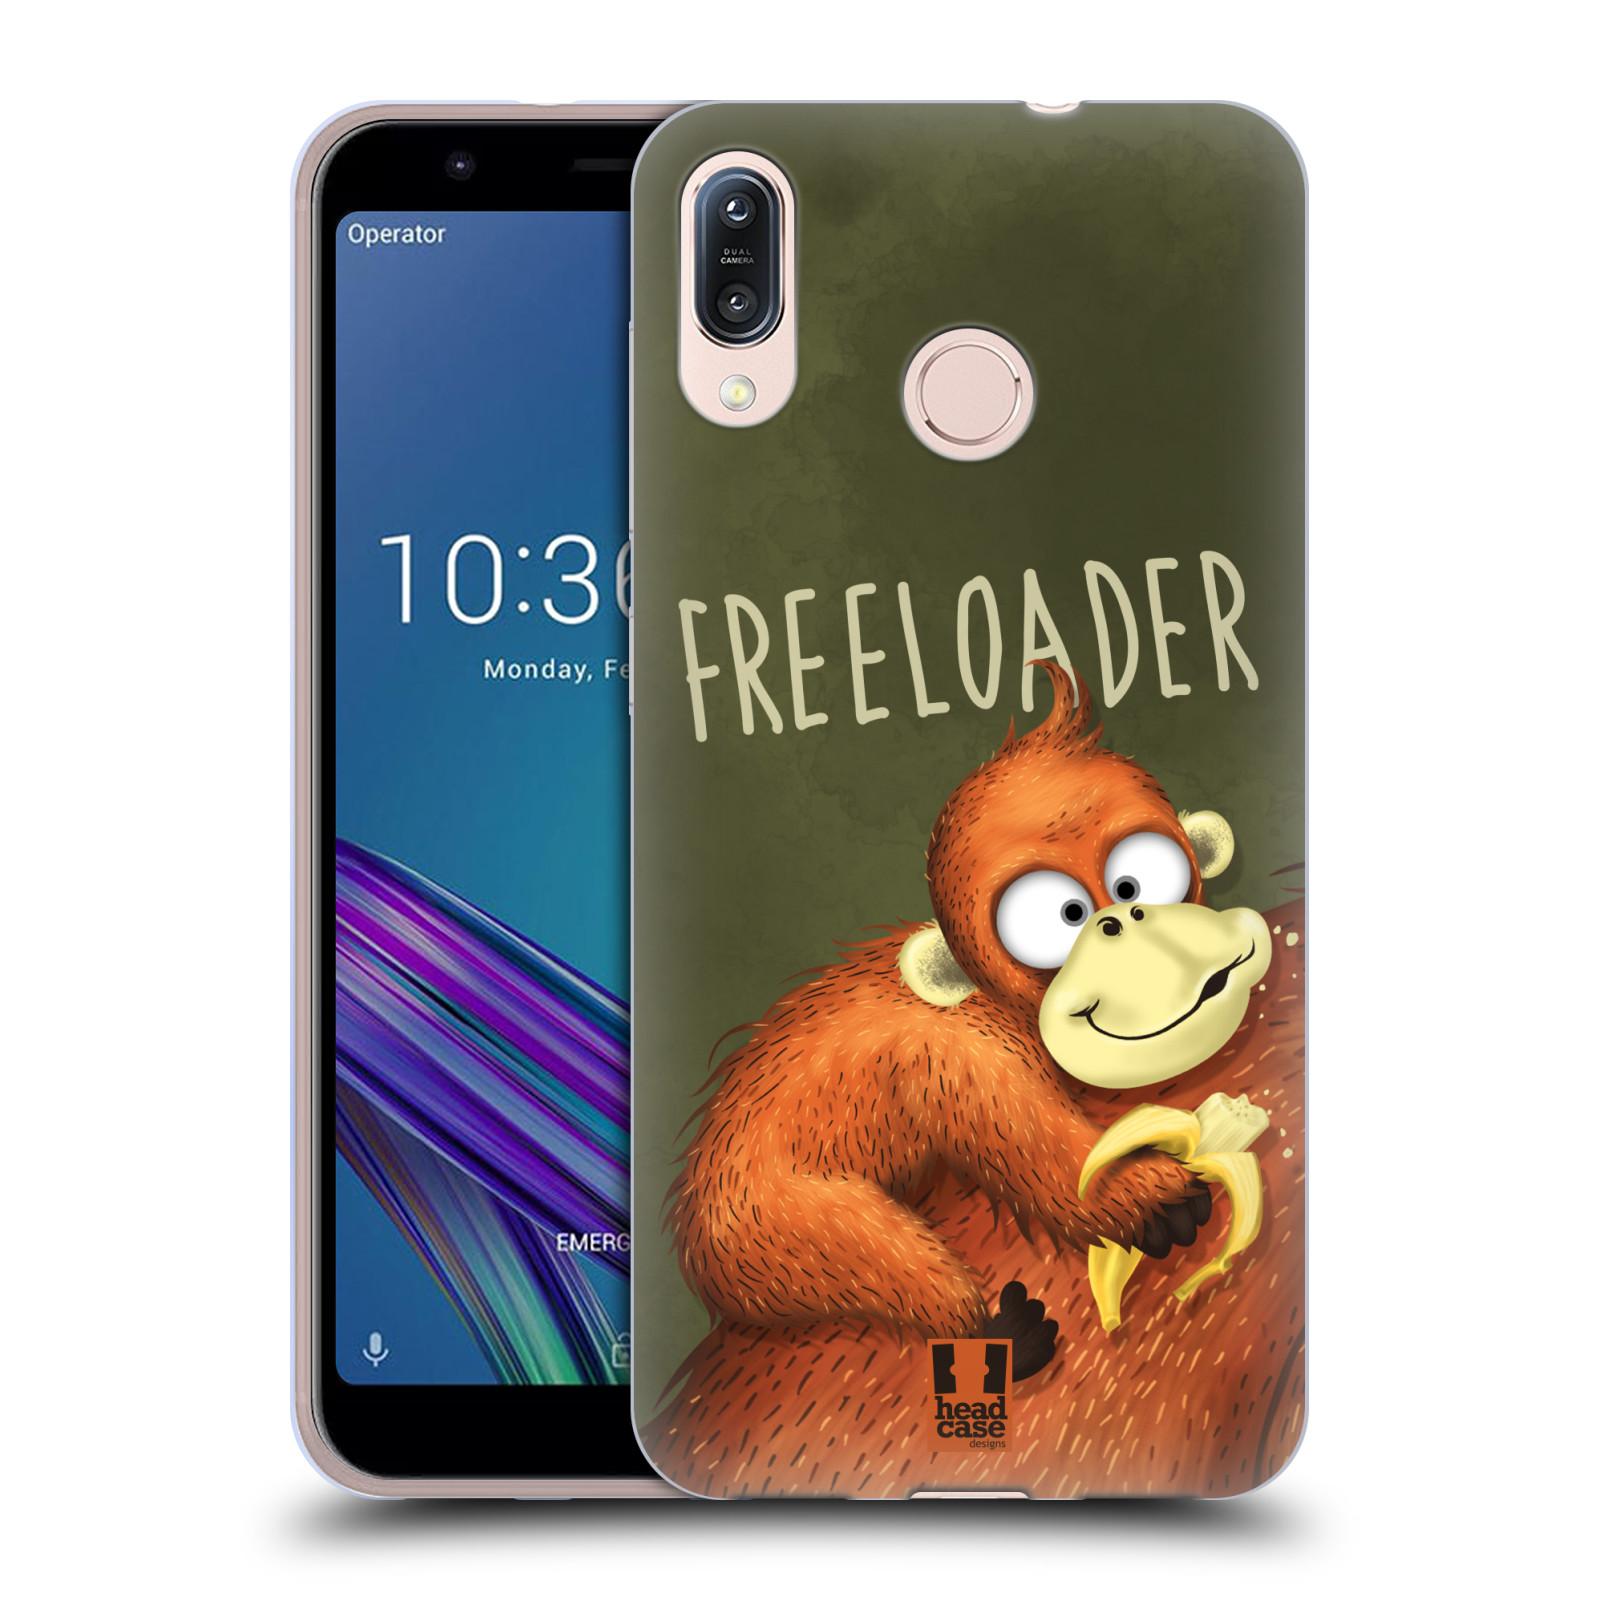 Silikonové pouzdro na mobil Asus Zenfone Max M1 ZB555KL - Head Case - Opičák Freeloader